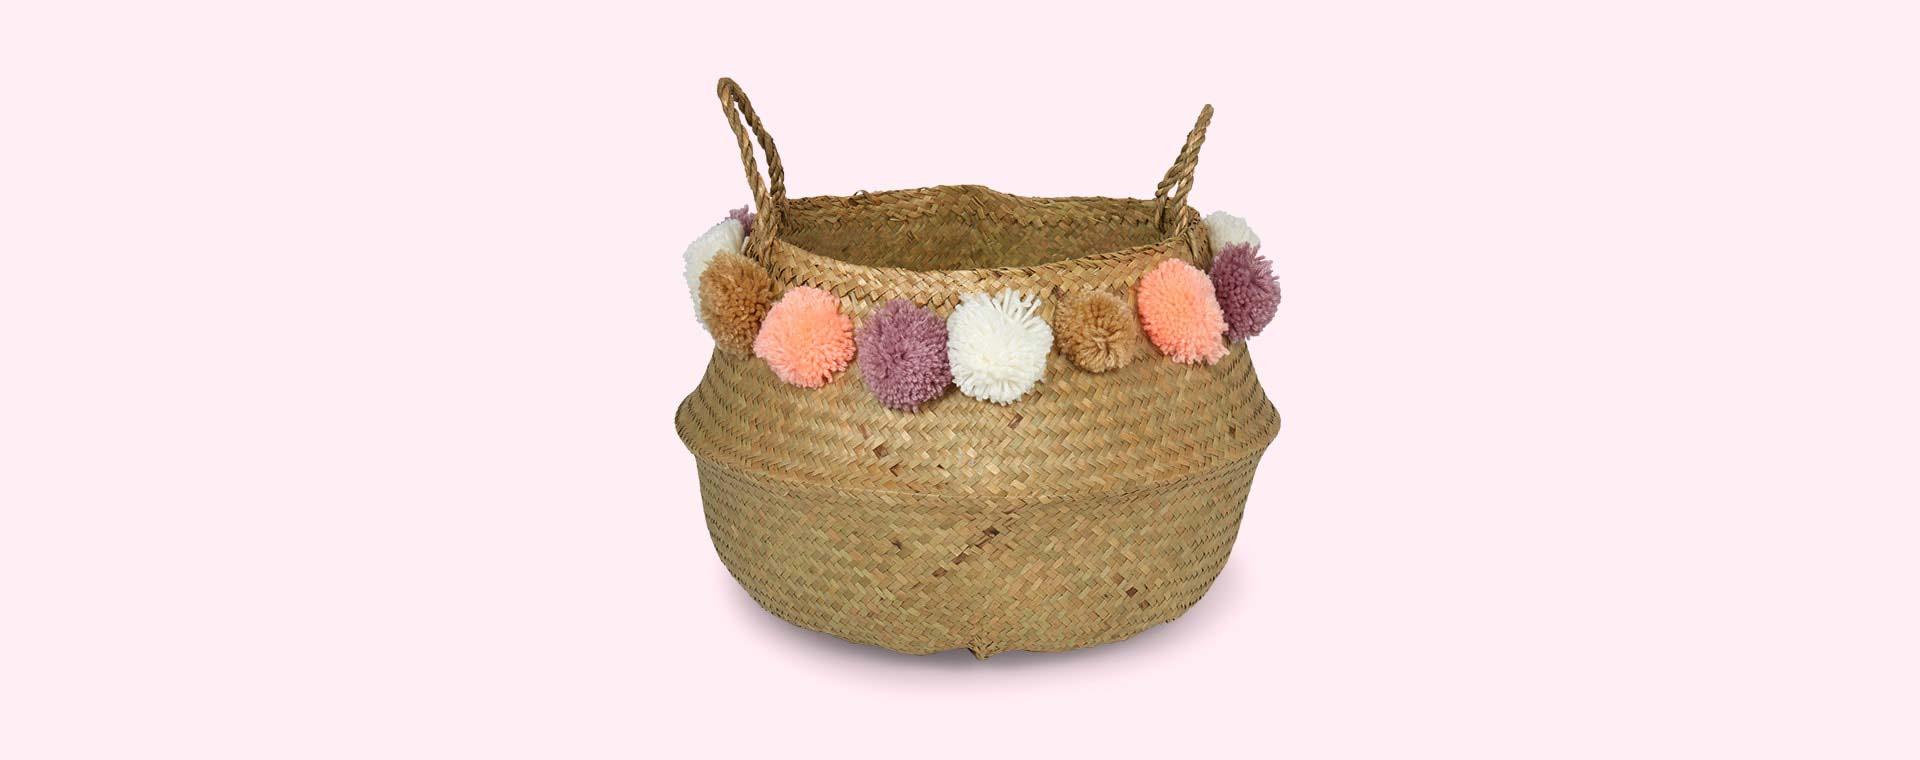 Pom Pom Bloomingville Medium Seagrass Basket with Pom Poms